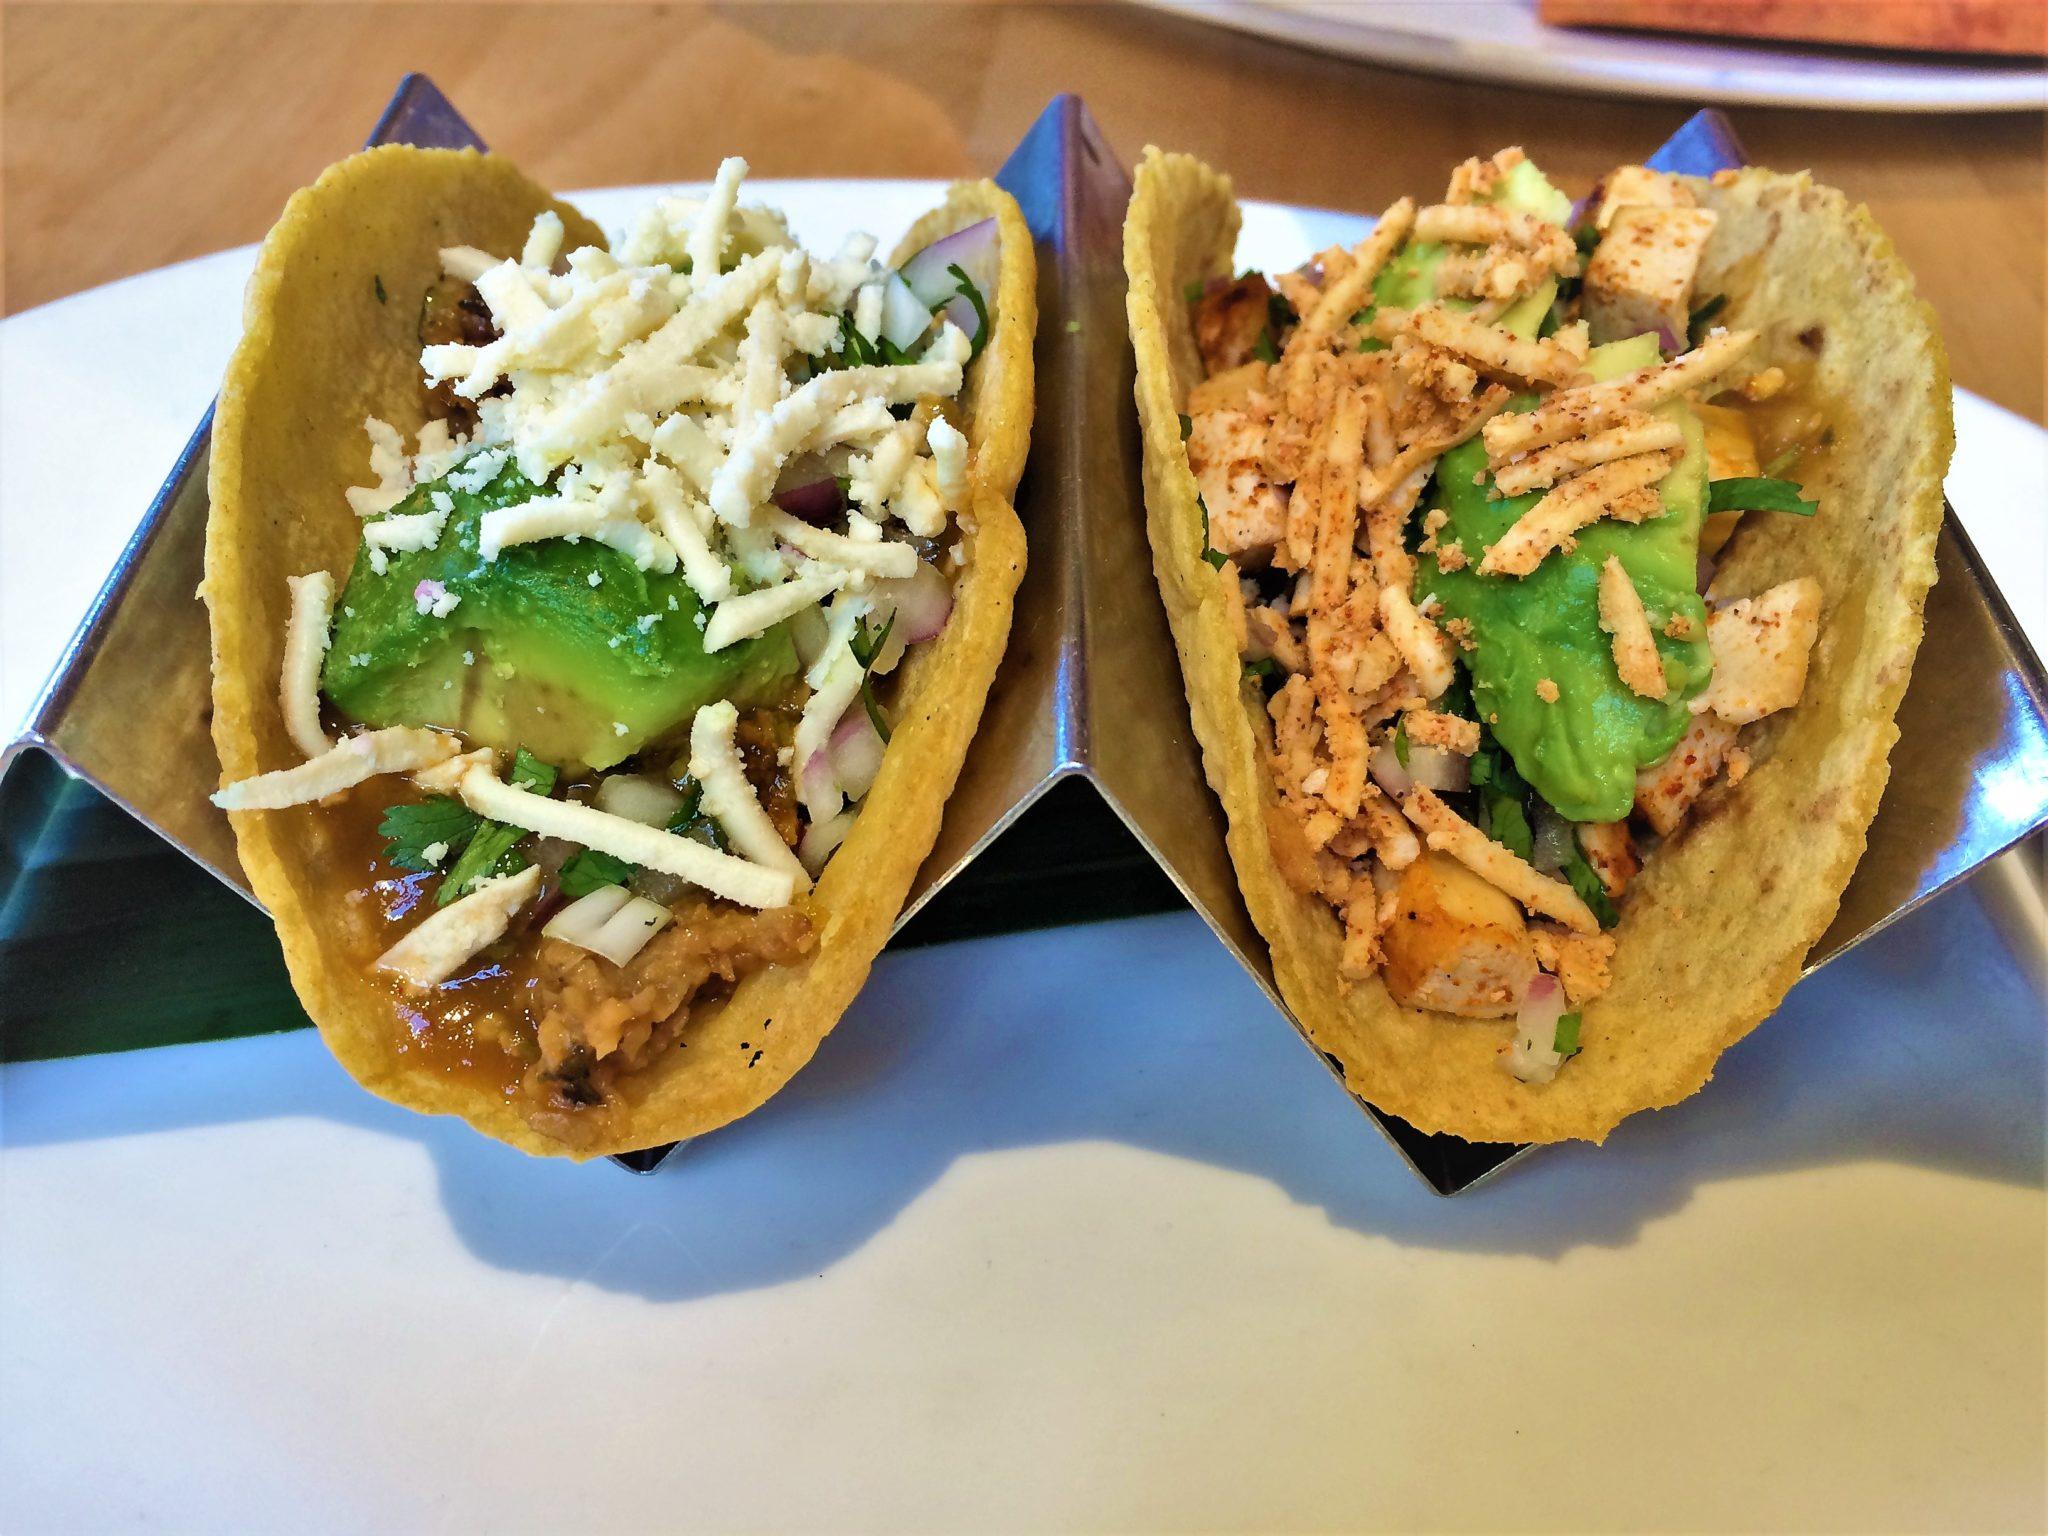 Vegan Tacos Los Angeles Tocaya Organica Best Vegan